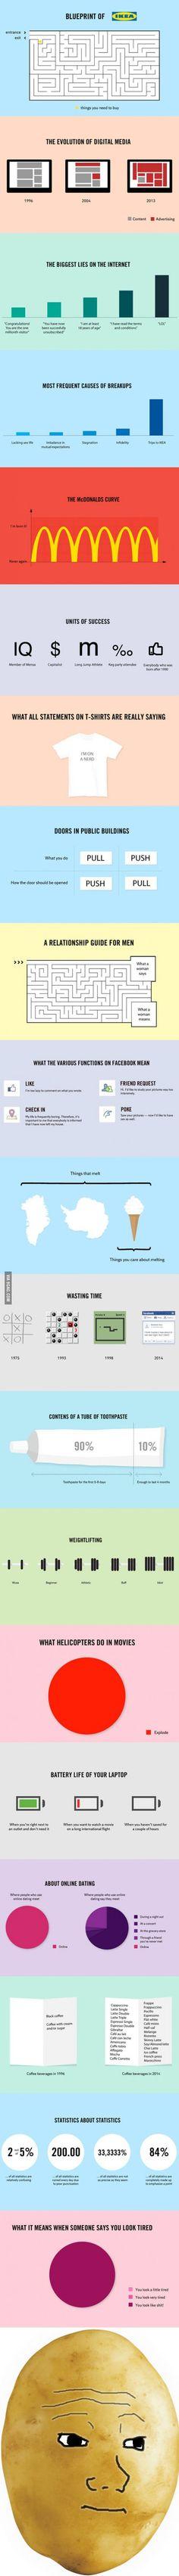 Fun Fact Infographic